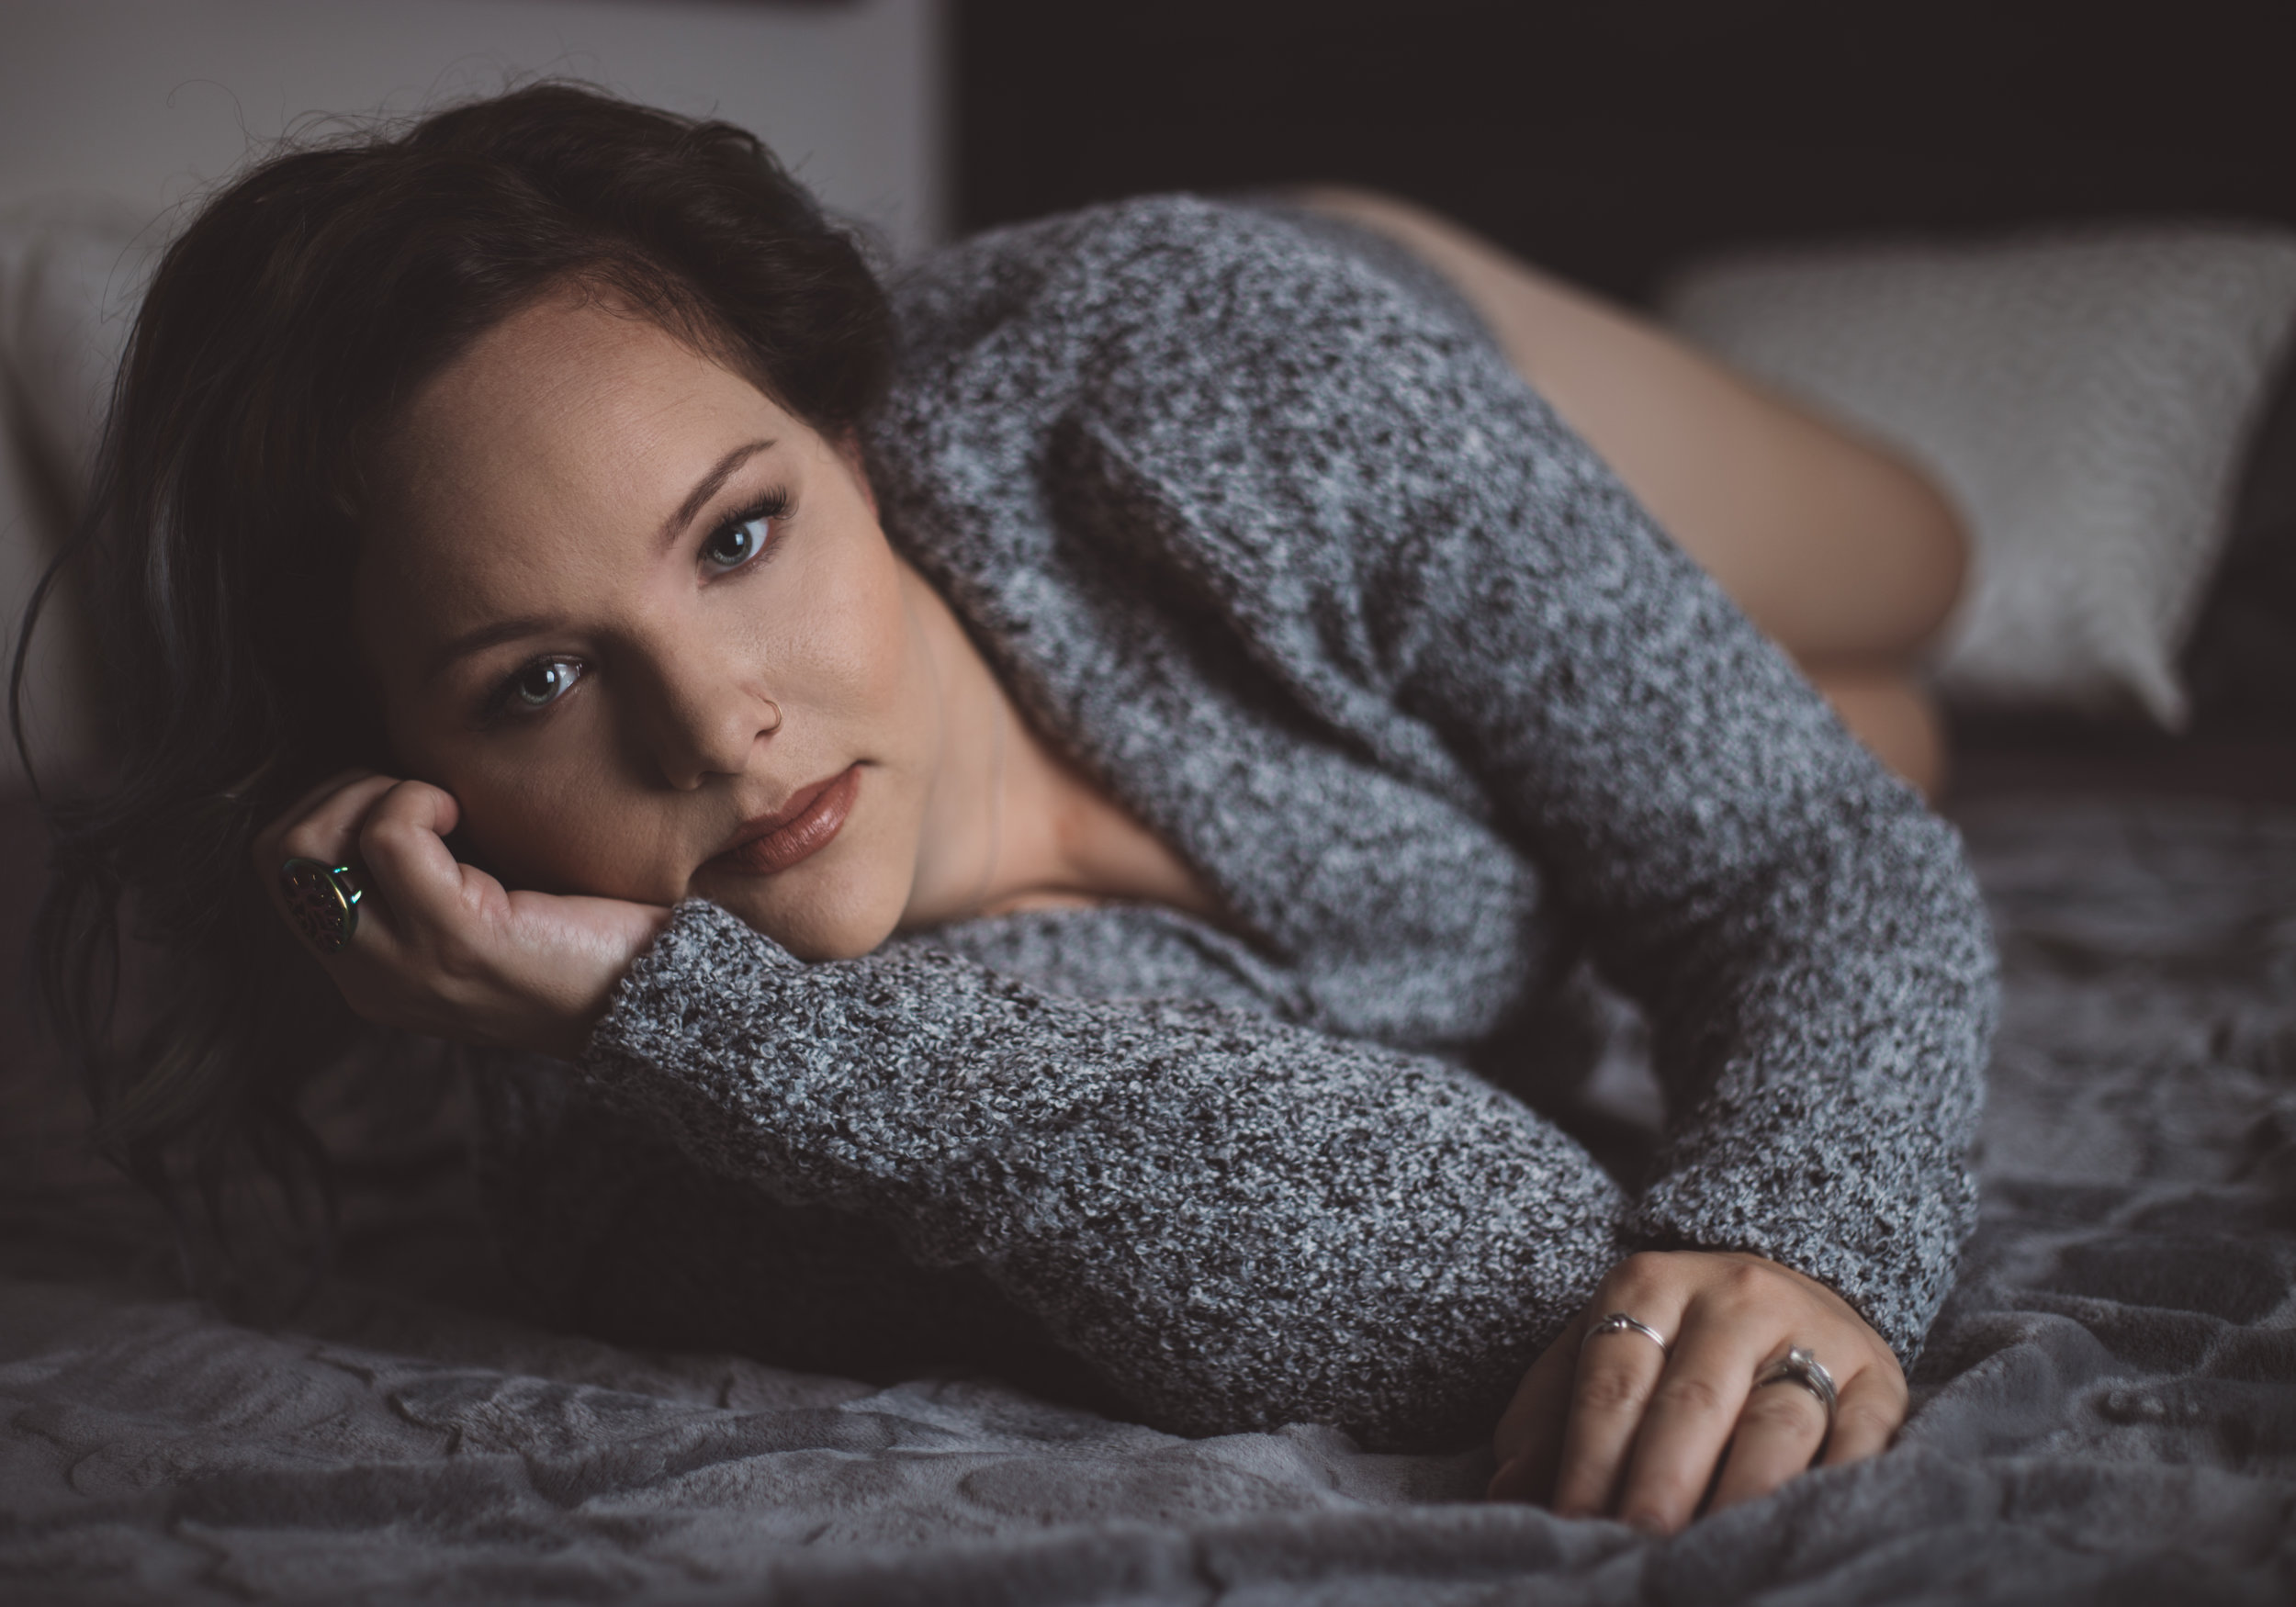 sweater-boudoir-photography-lake-jackson-texas-sincerely-you-portraits